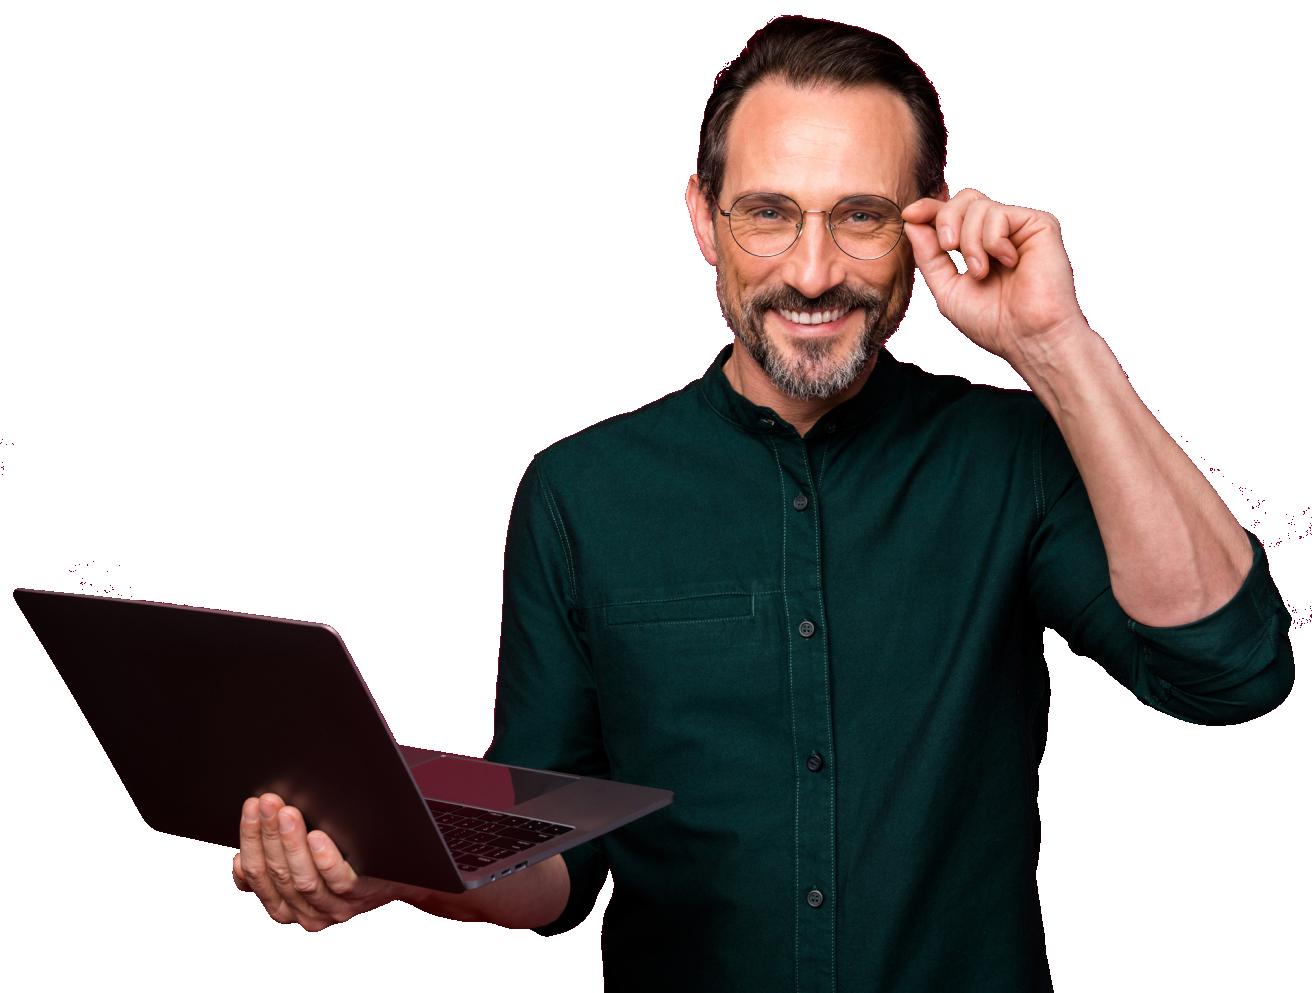 Man holding a computer